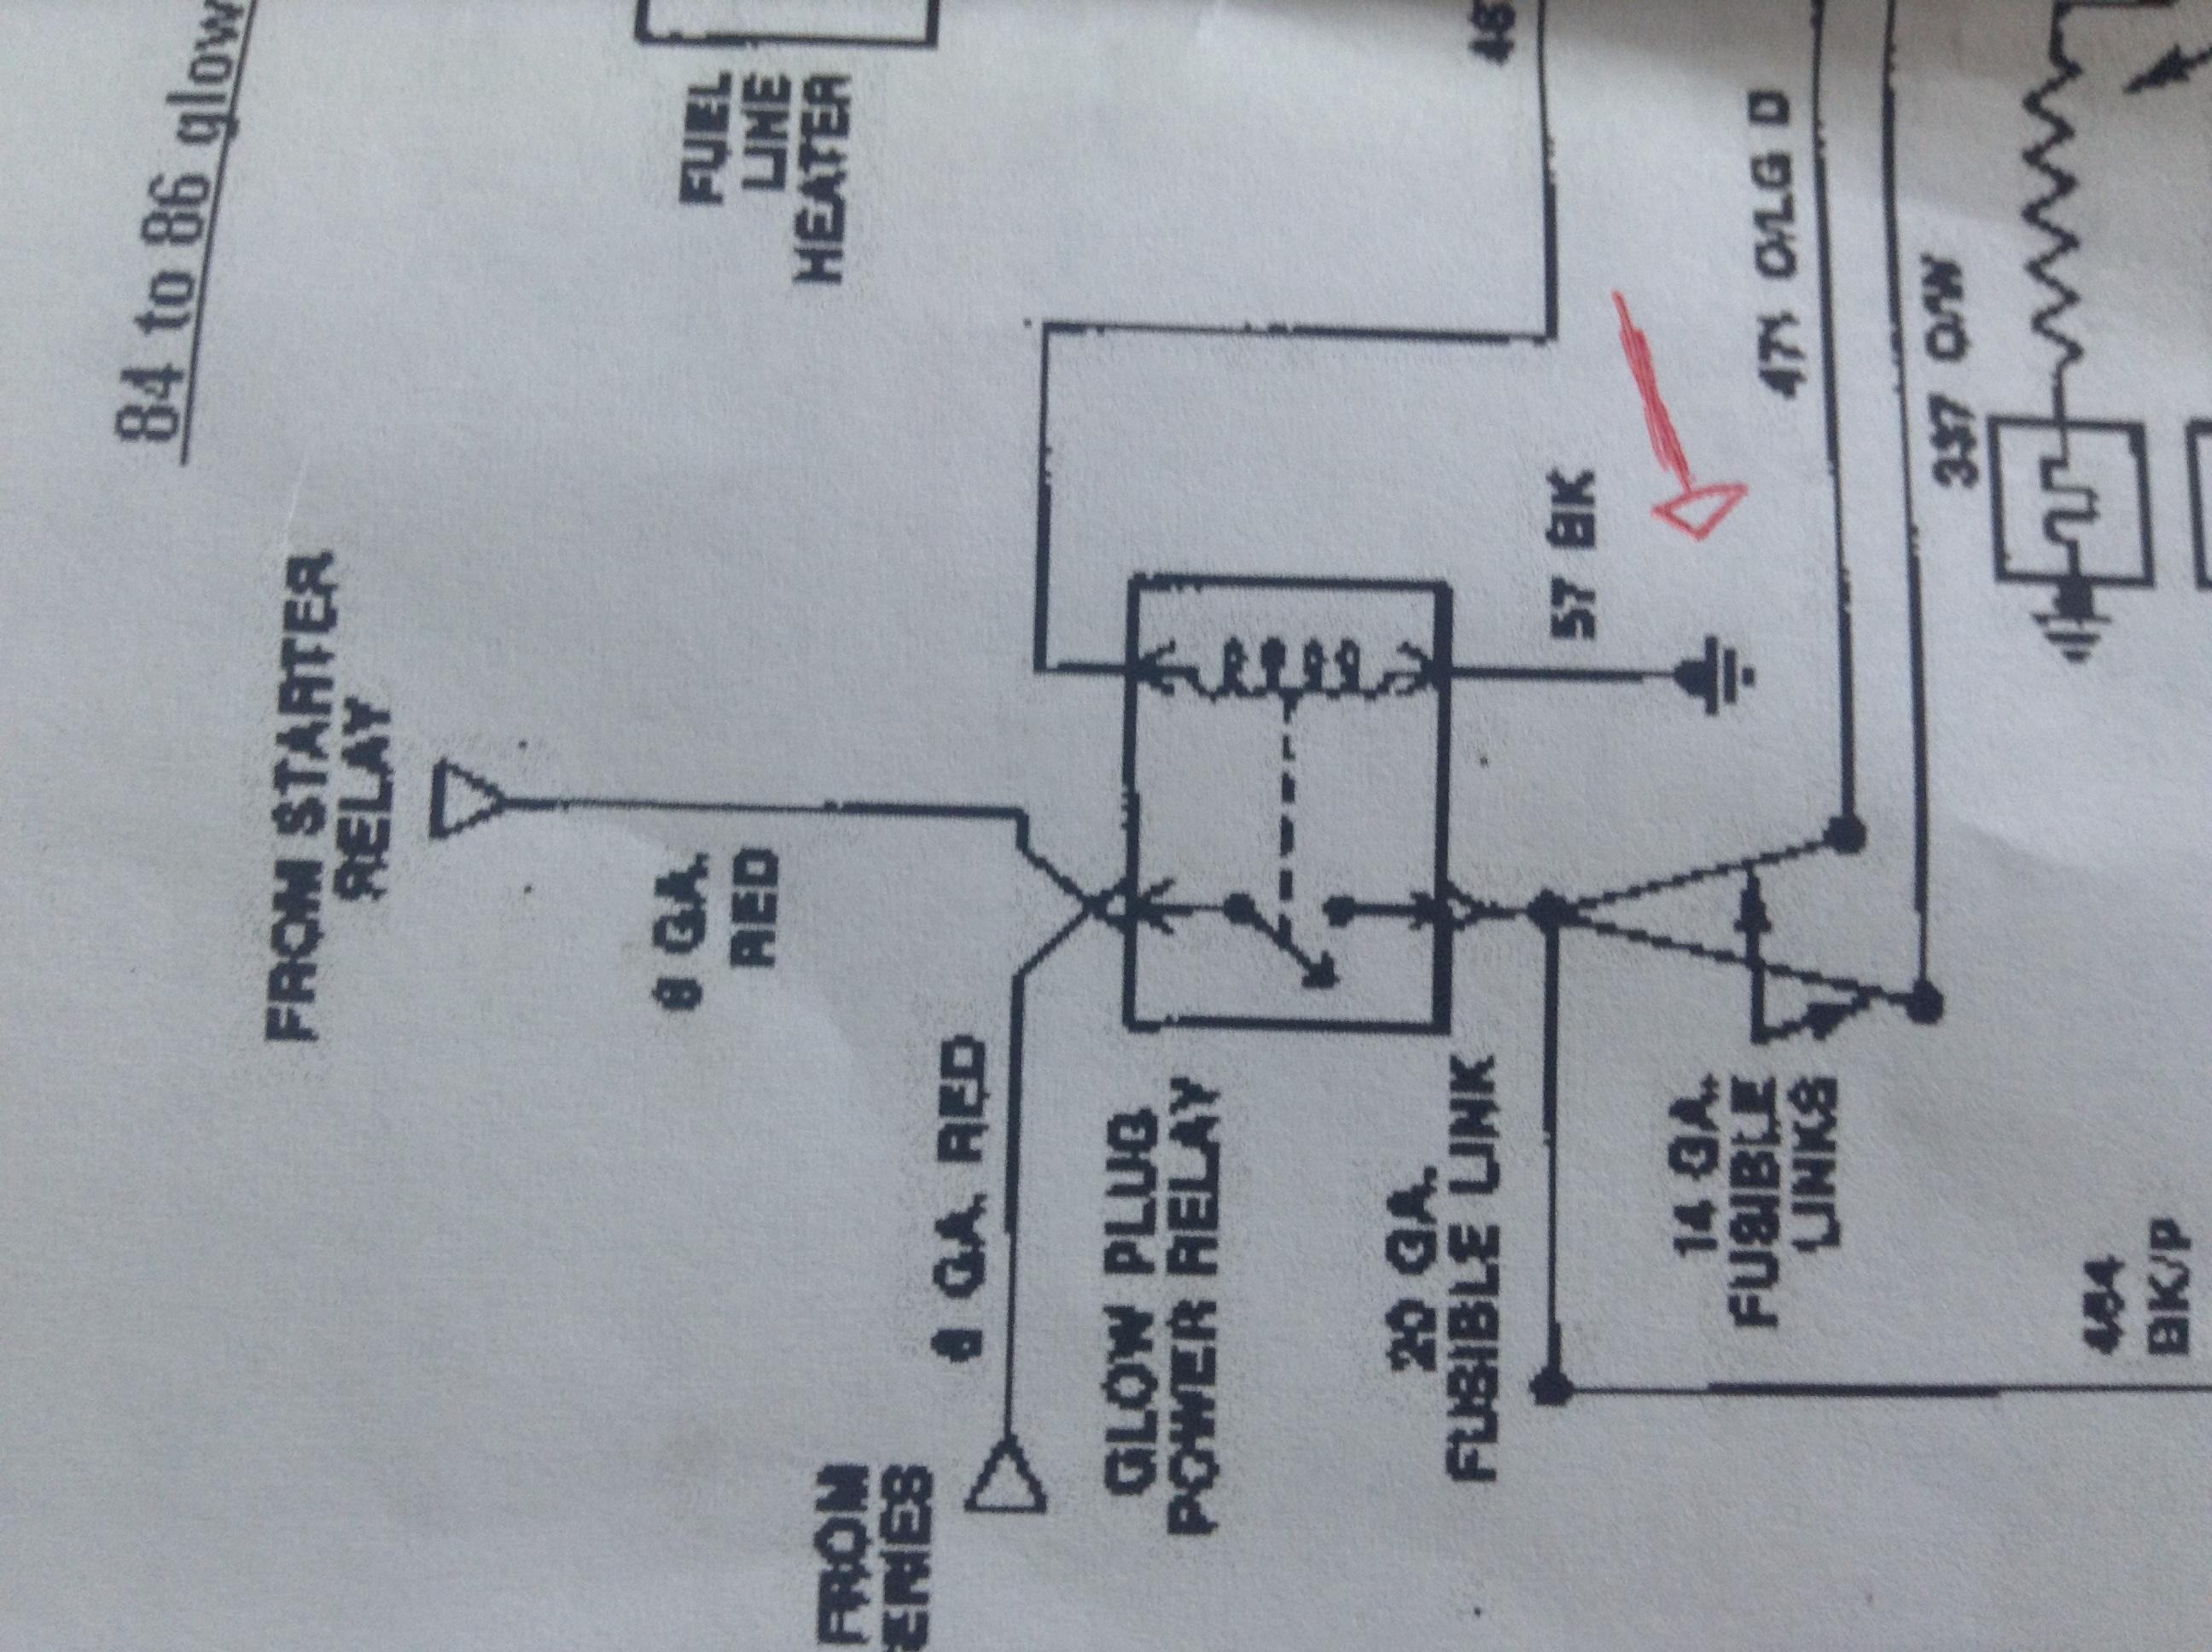 106545d1488923393 glow plug relay wiring easy one img_0041 glow plug relay wiring ? (easy one) diesel forum thedieselstop com